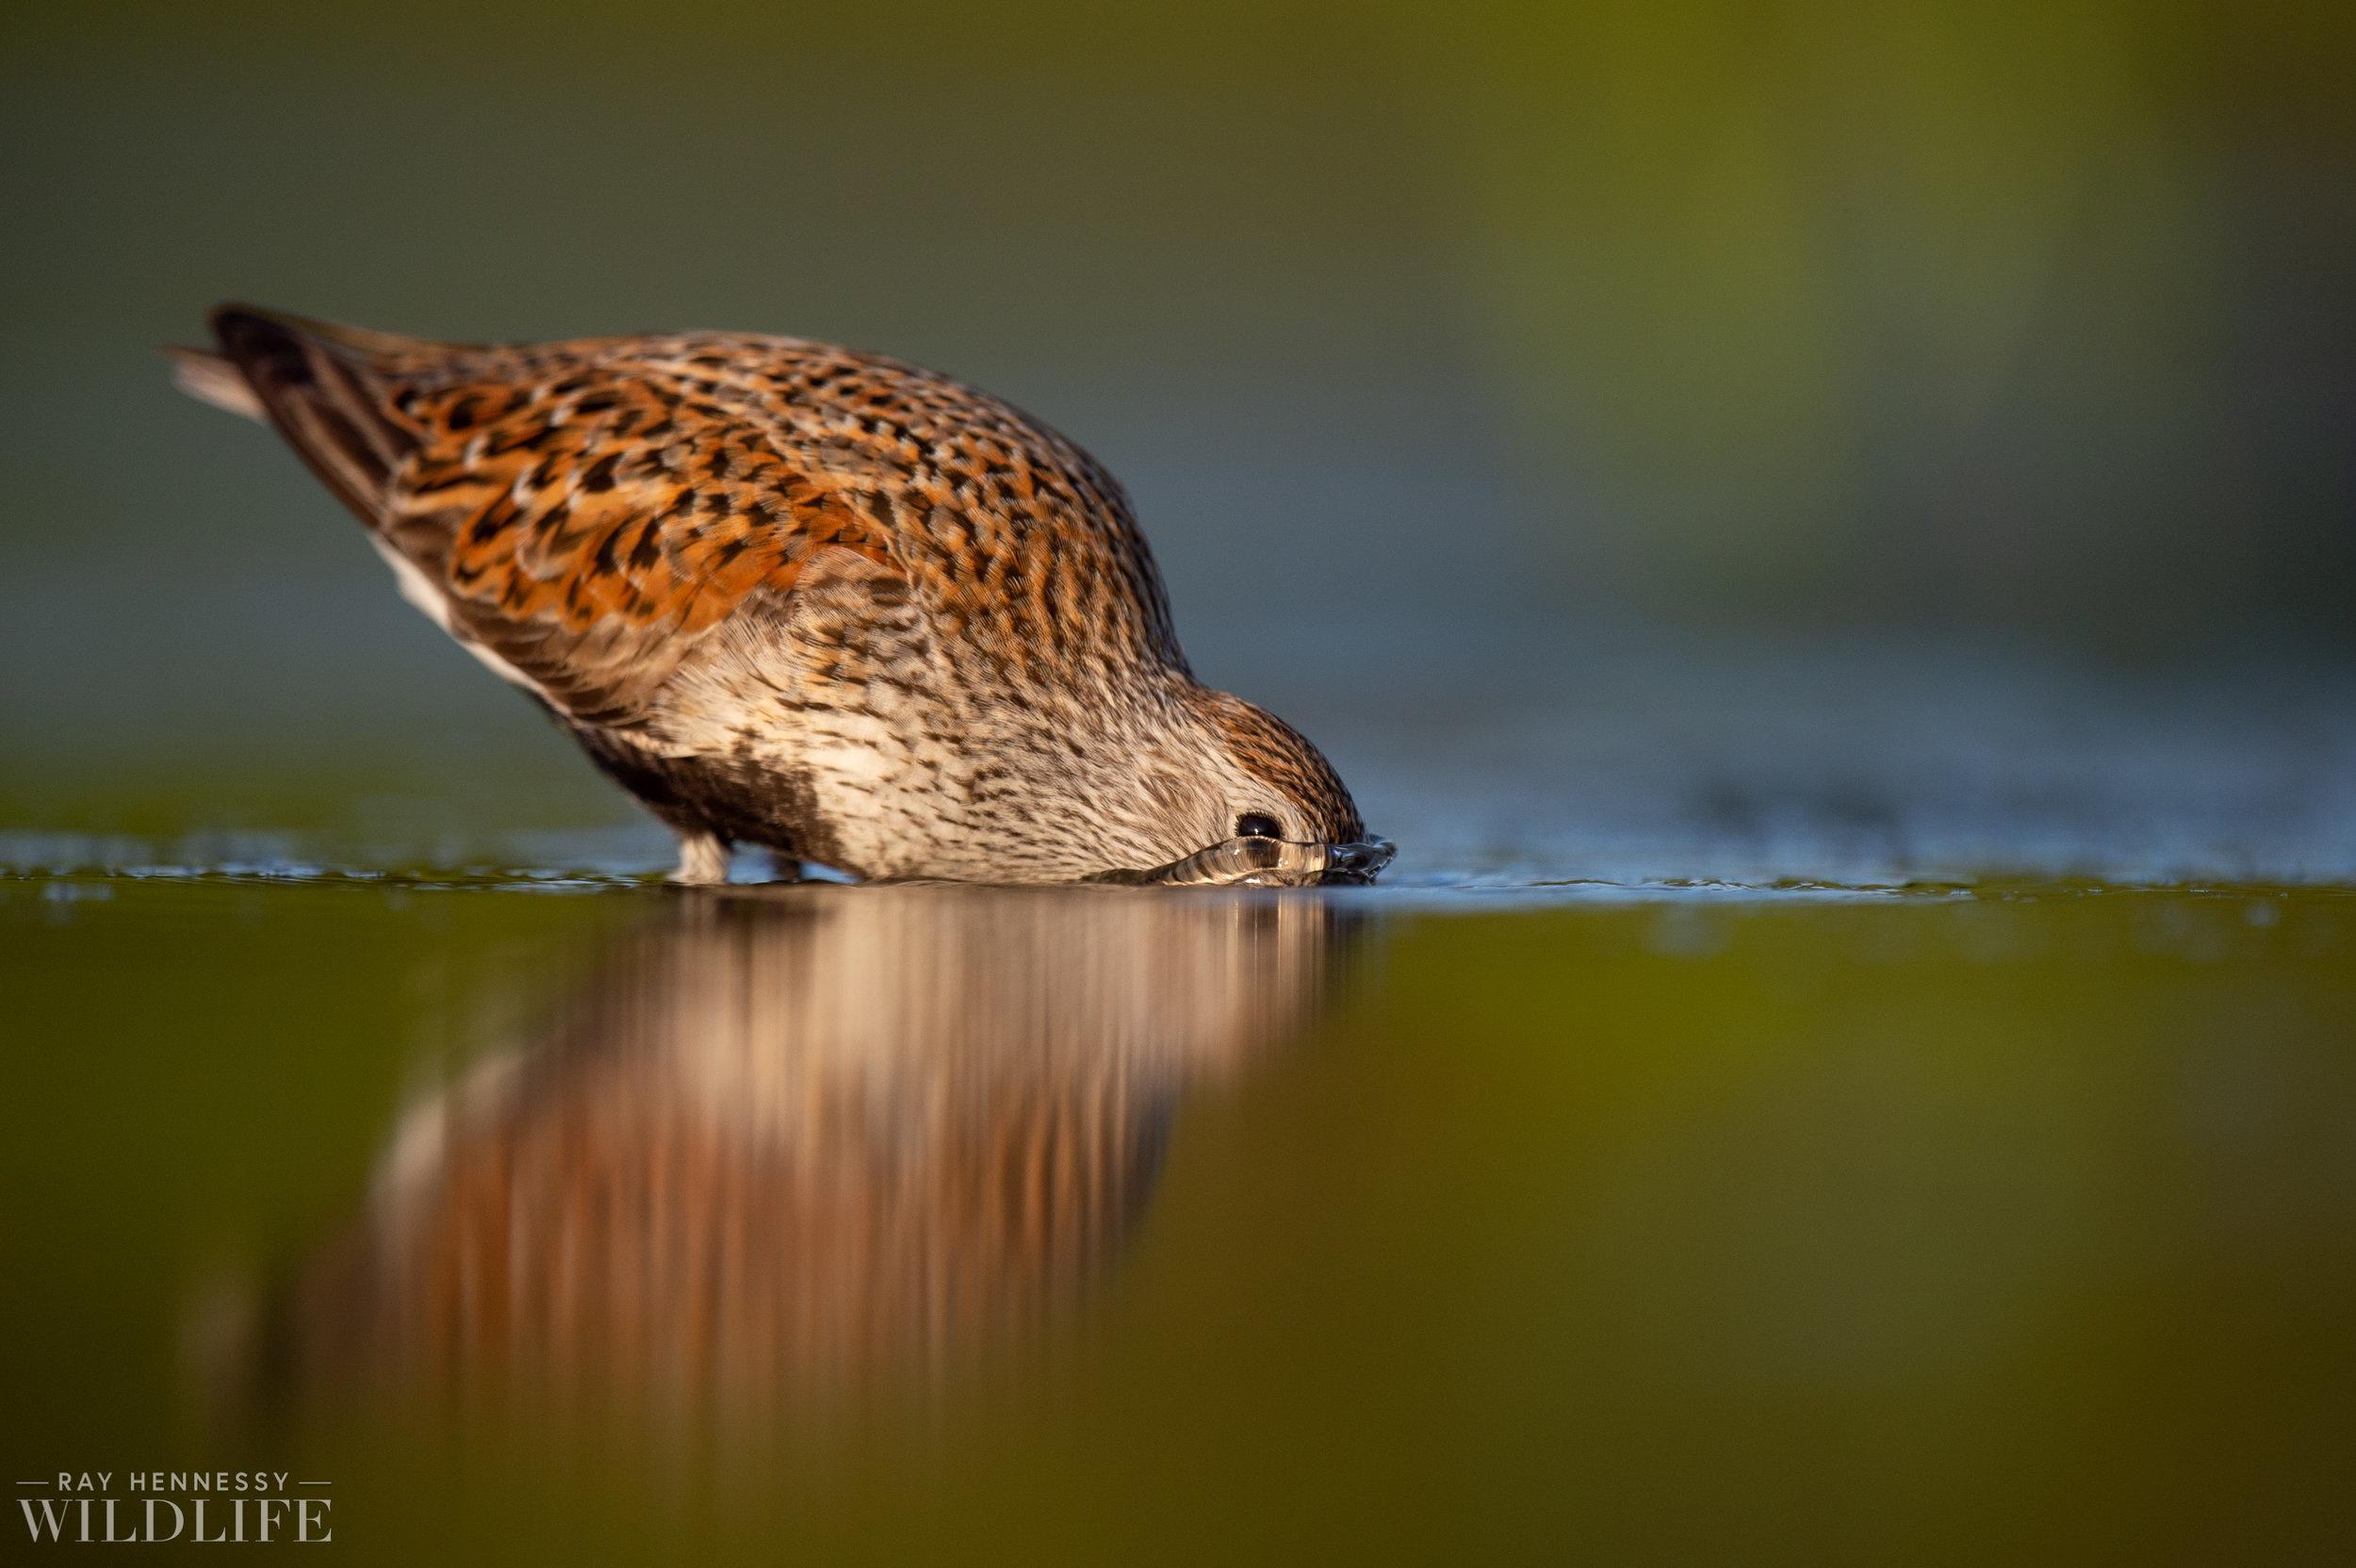 016_shorebirds-prothonotary-warbler.jpg